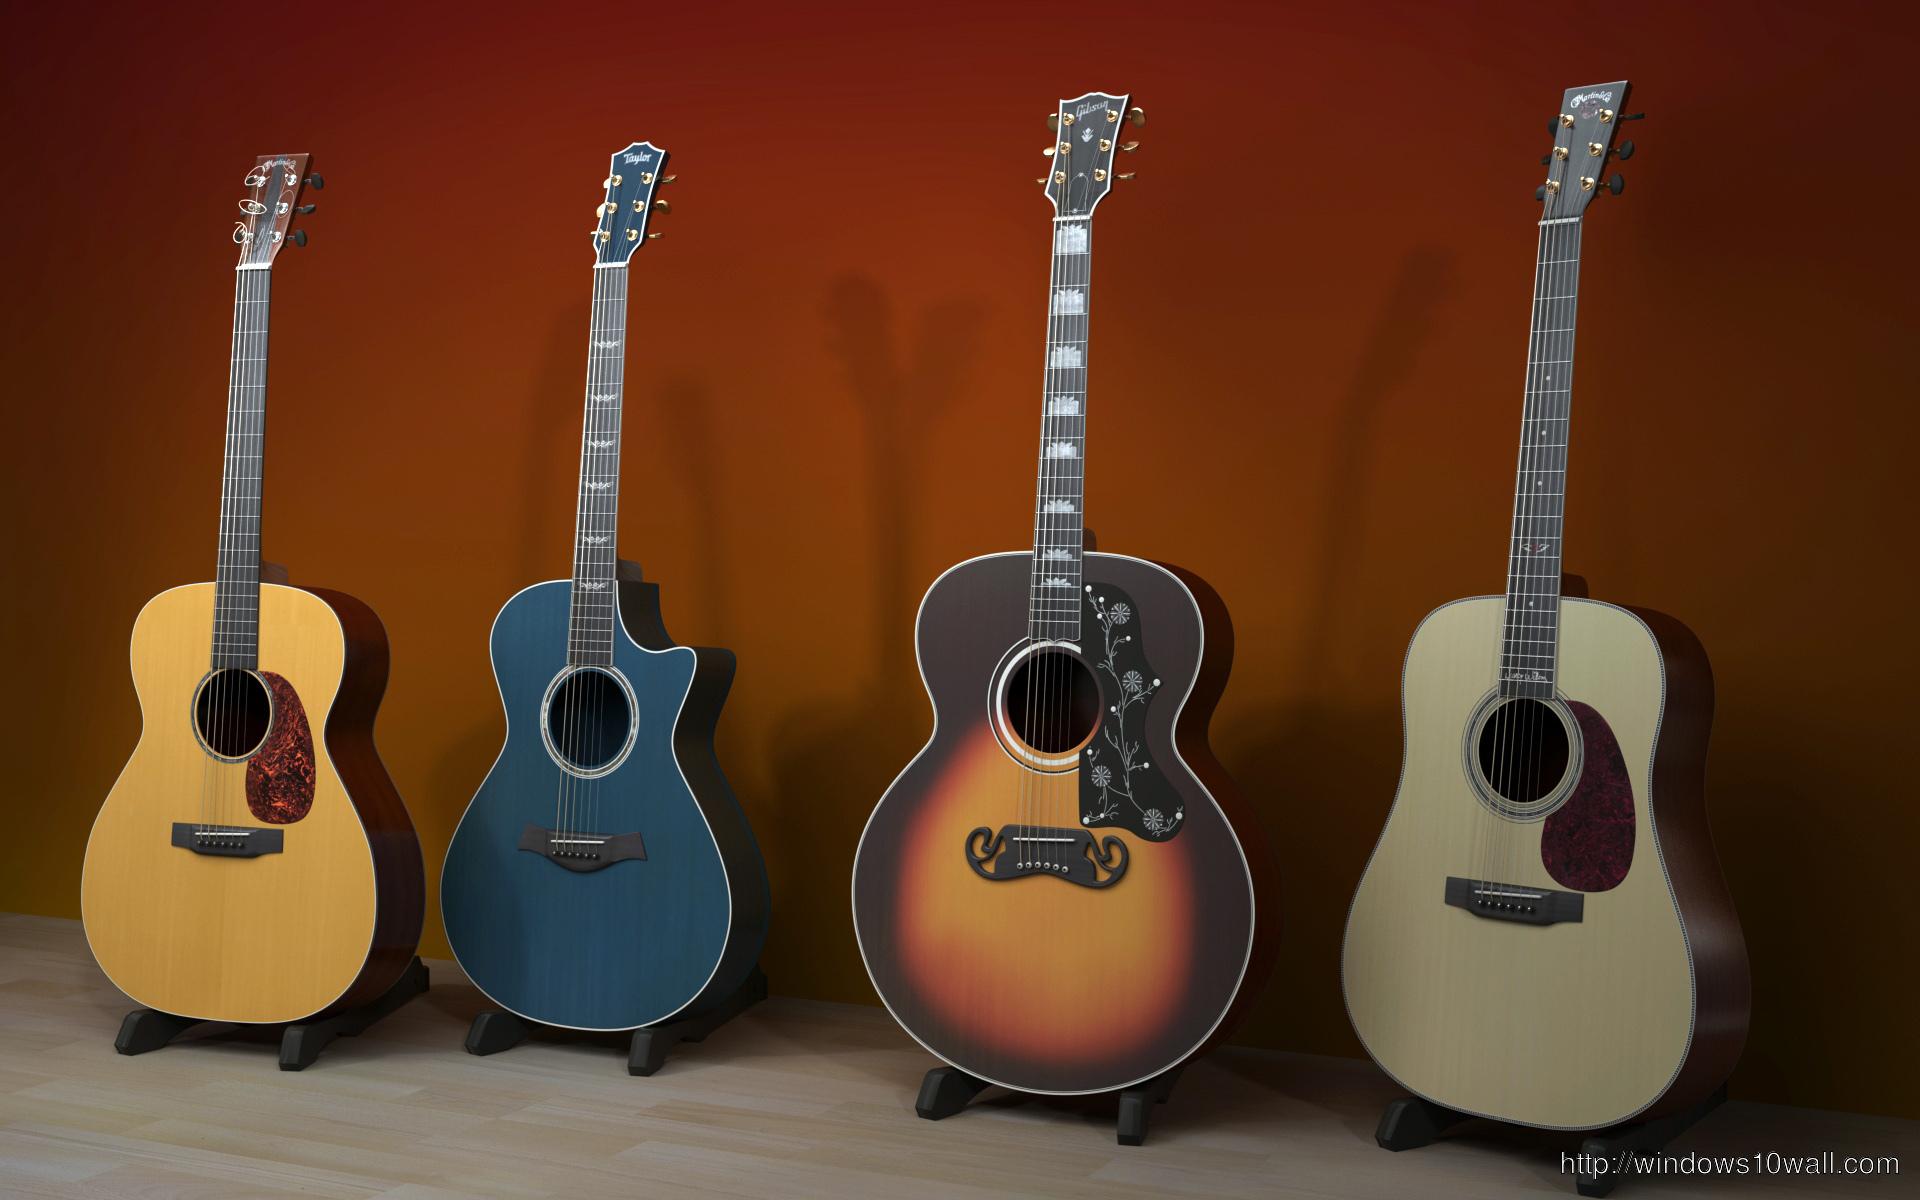 Top Guitar Hd Wallpaper Windows 10 Wallpapers